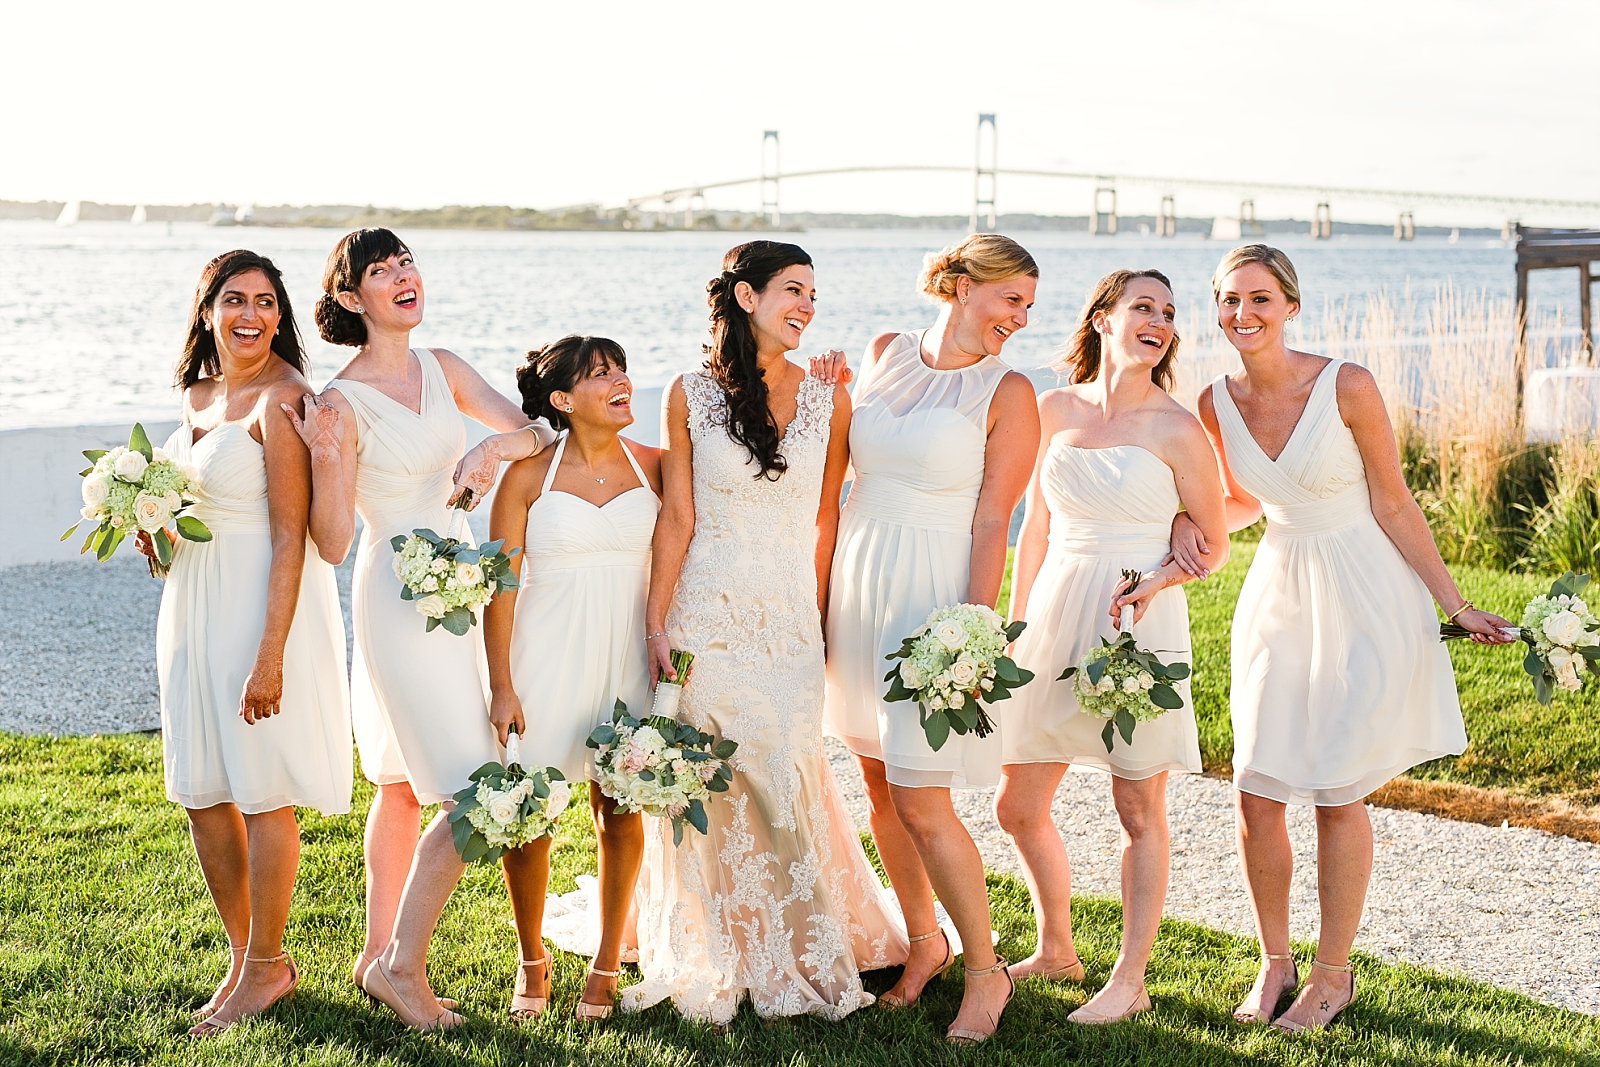 Newport_Wedding_Photographer_RaAj_Gallery_61.jpg